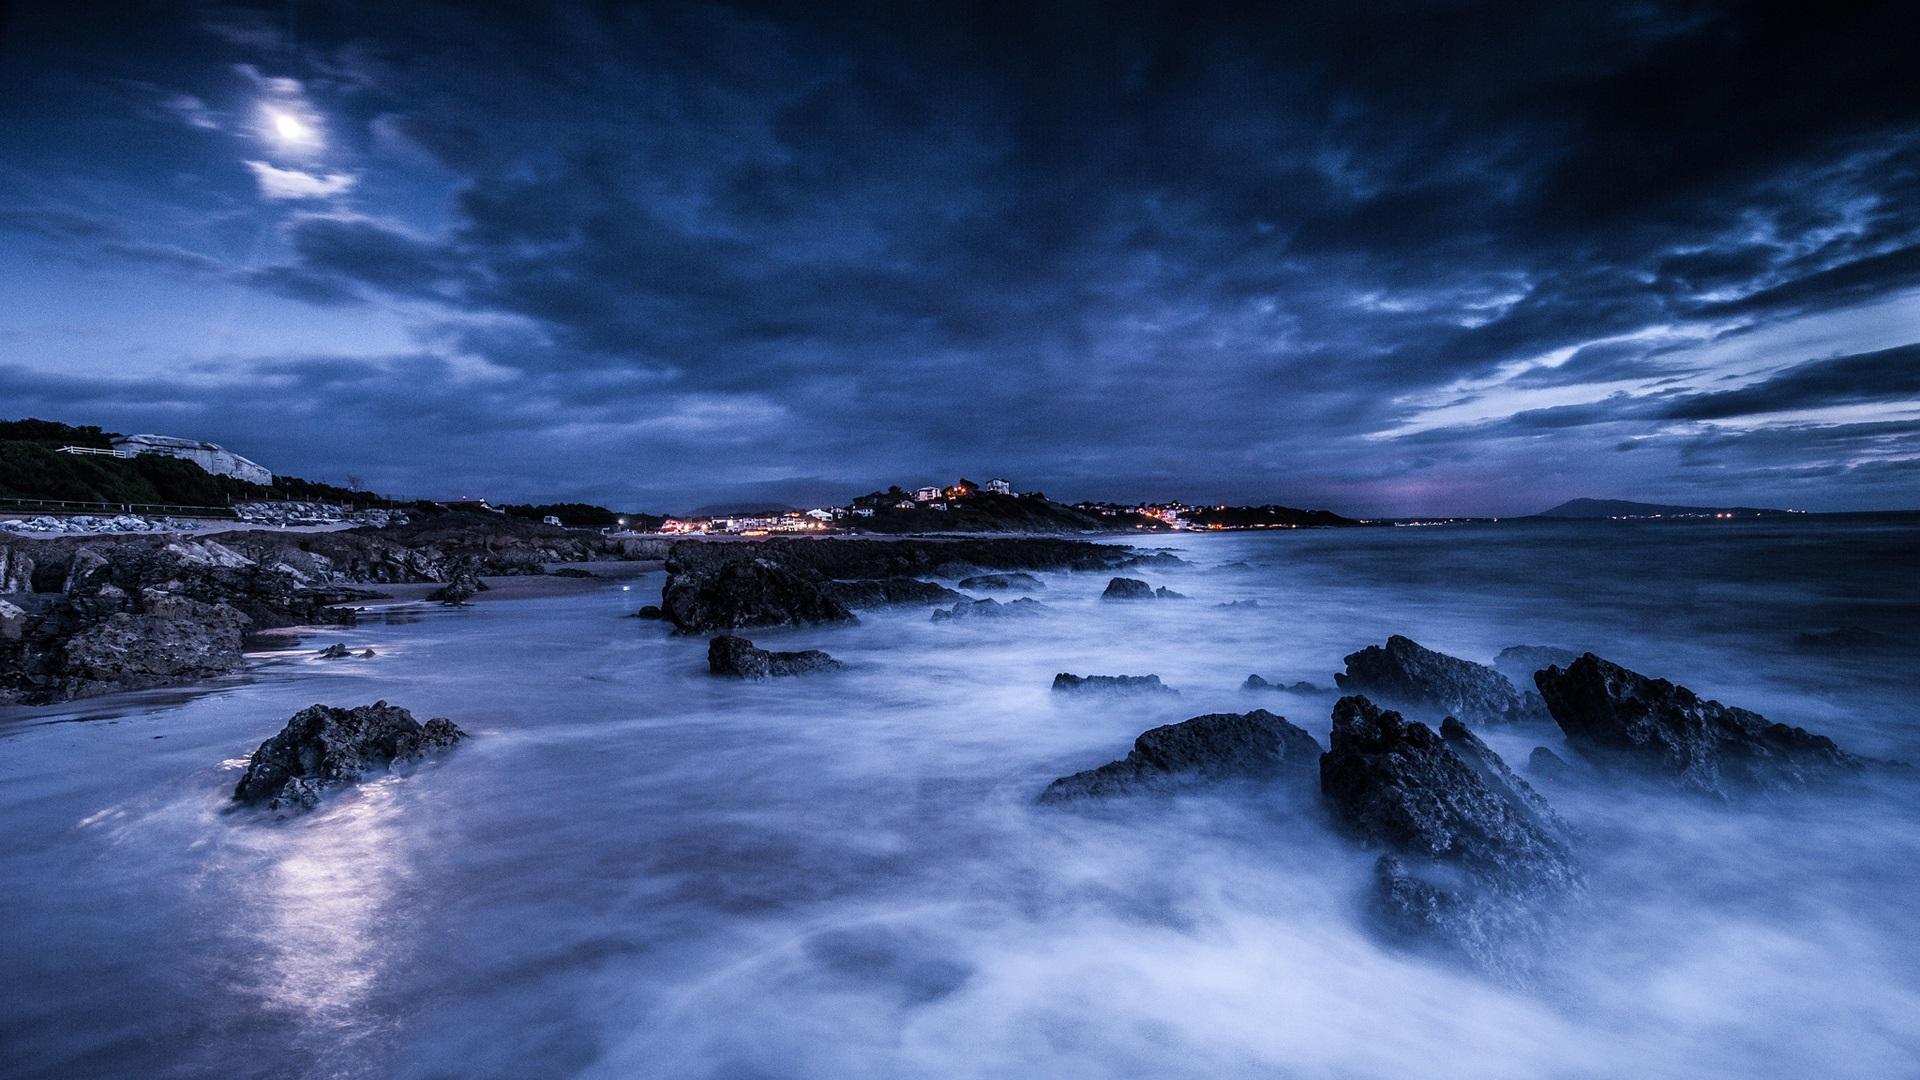 Mar, noche, luna, nubes, rocas, orilla, luces, azul Fondos ...